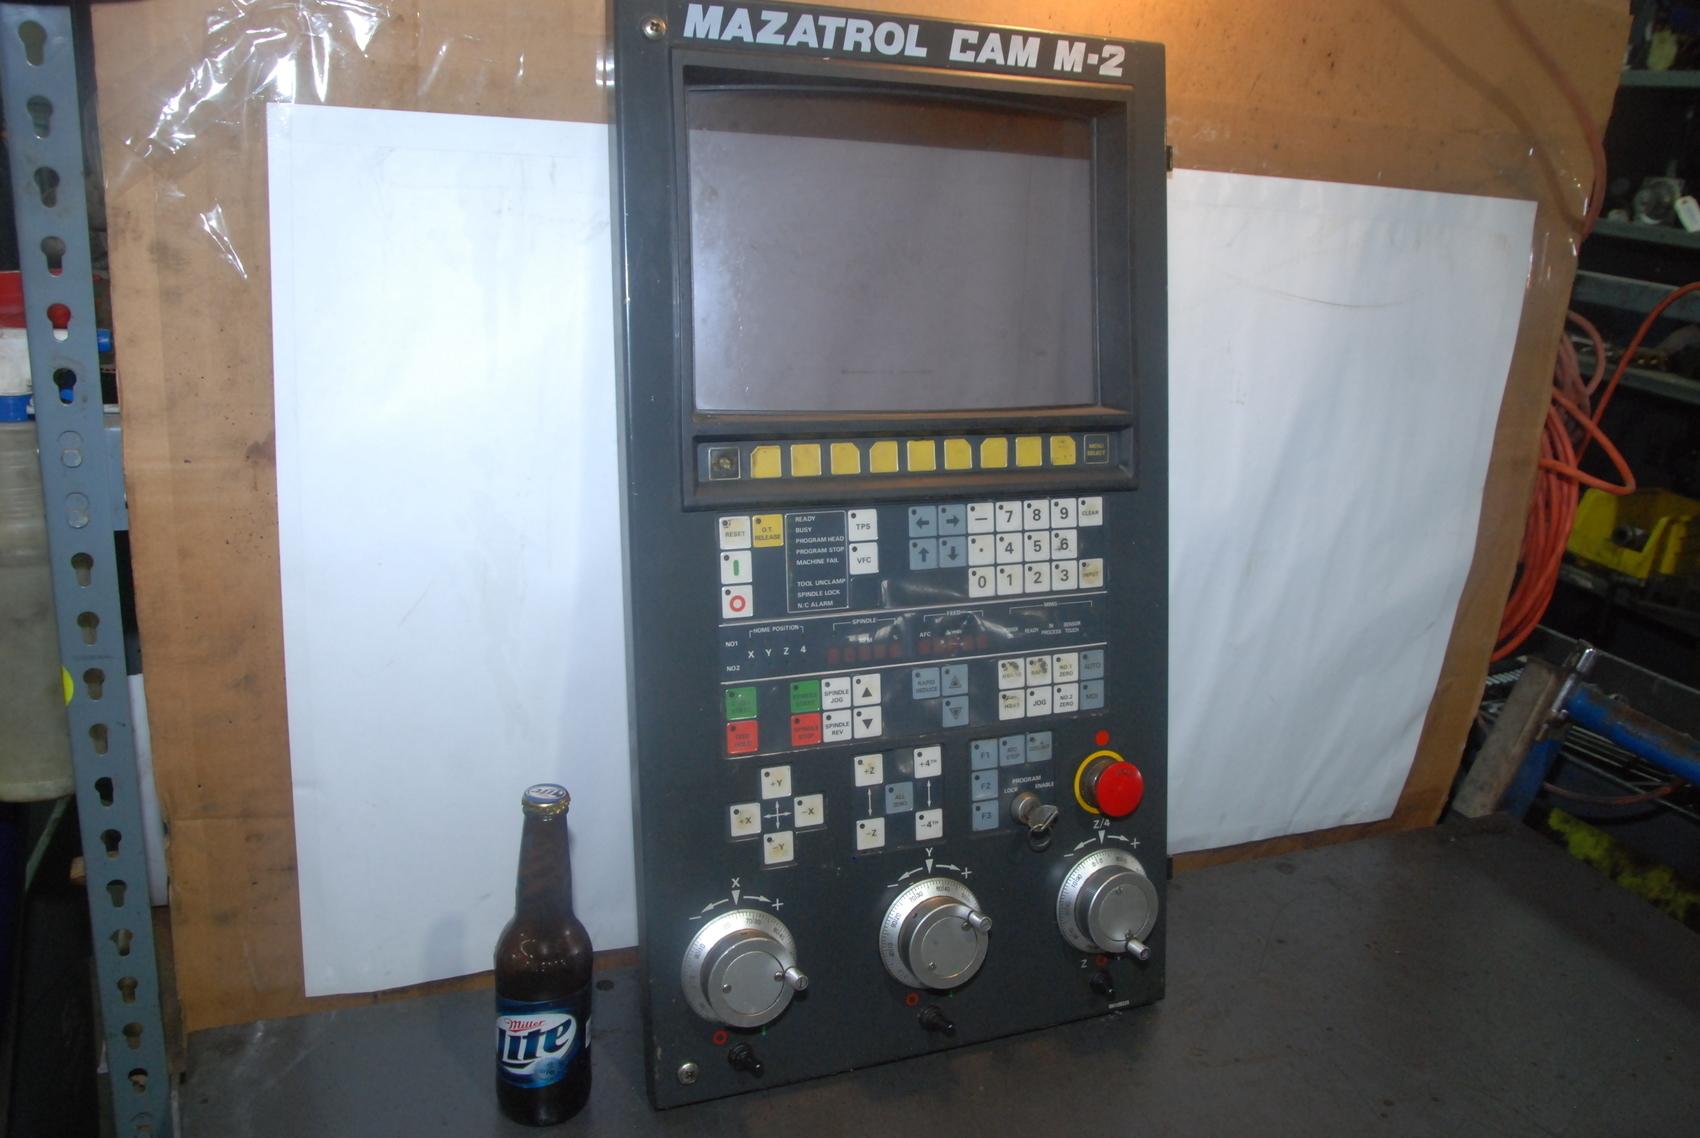 mazatrol cam m2 tv cnc monitor control pendant